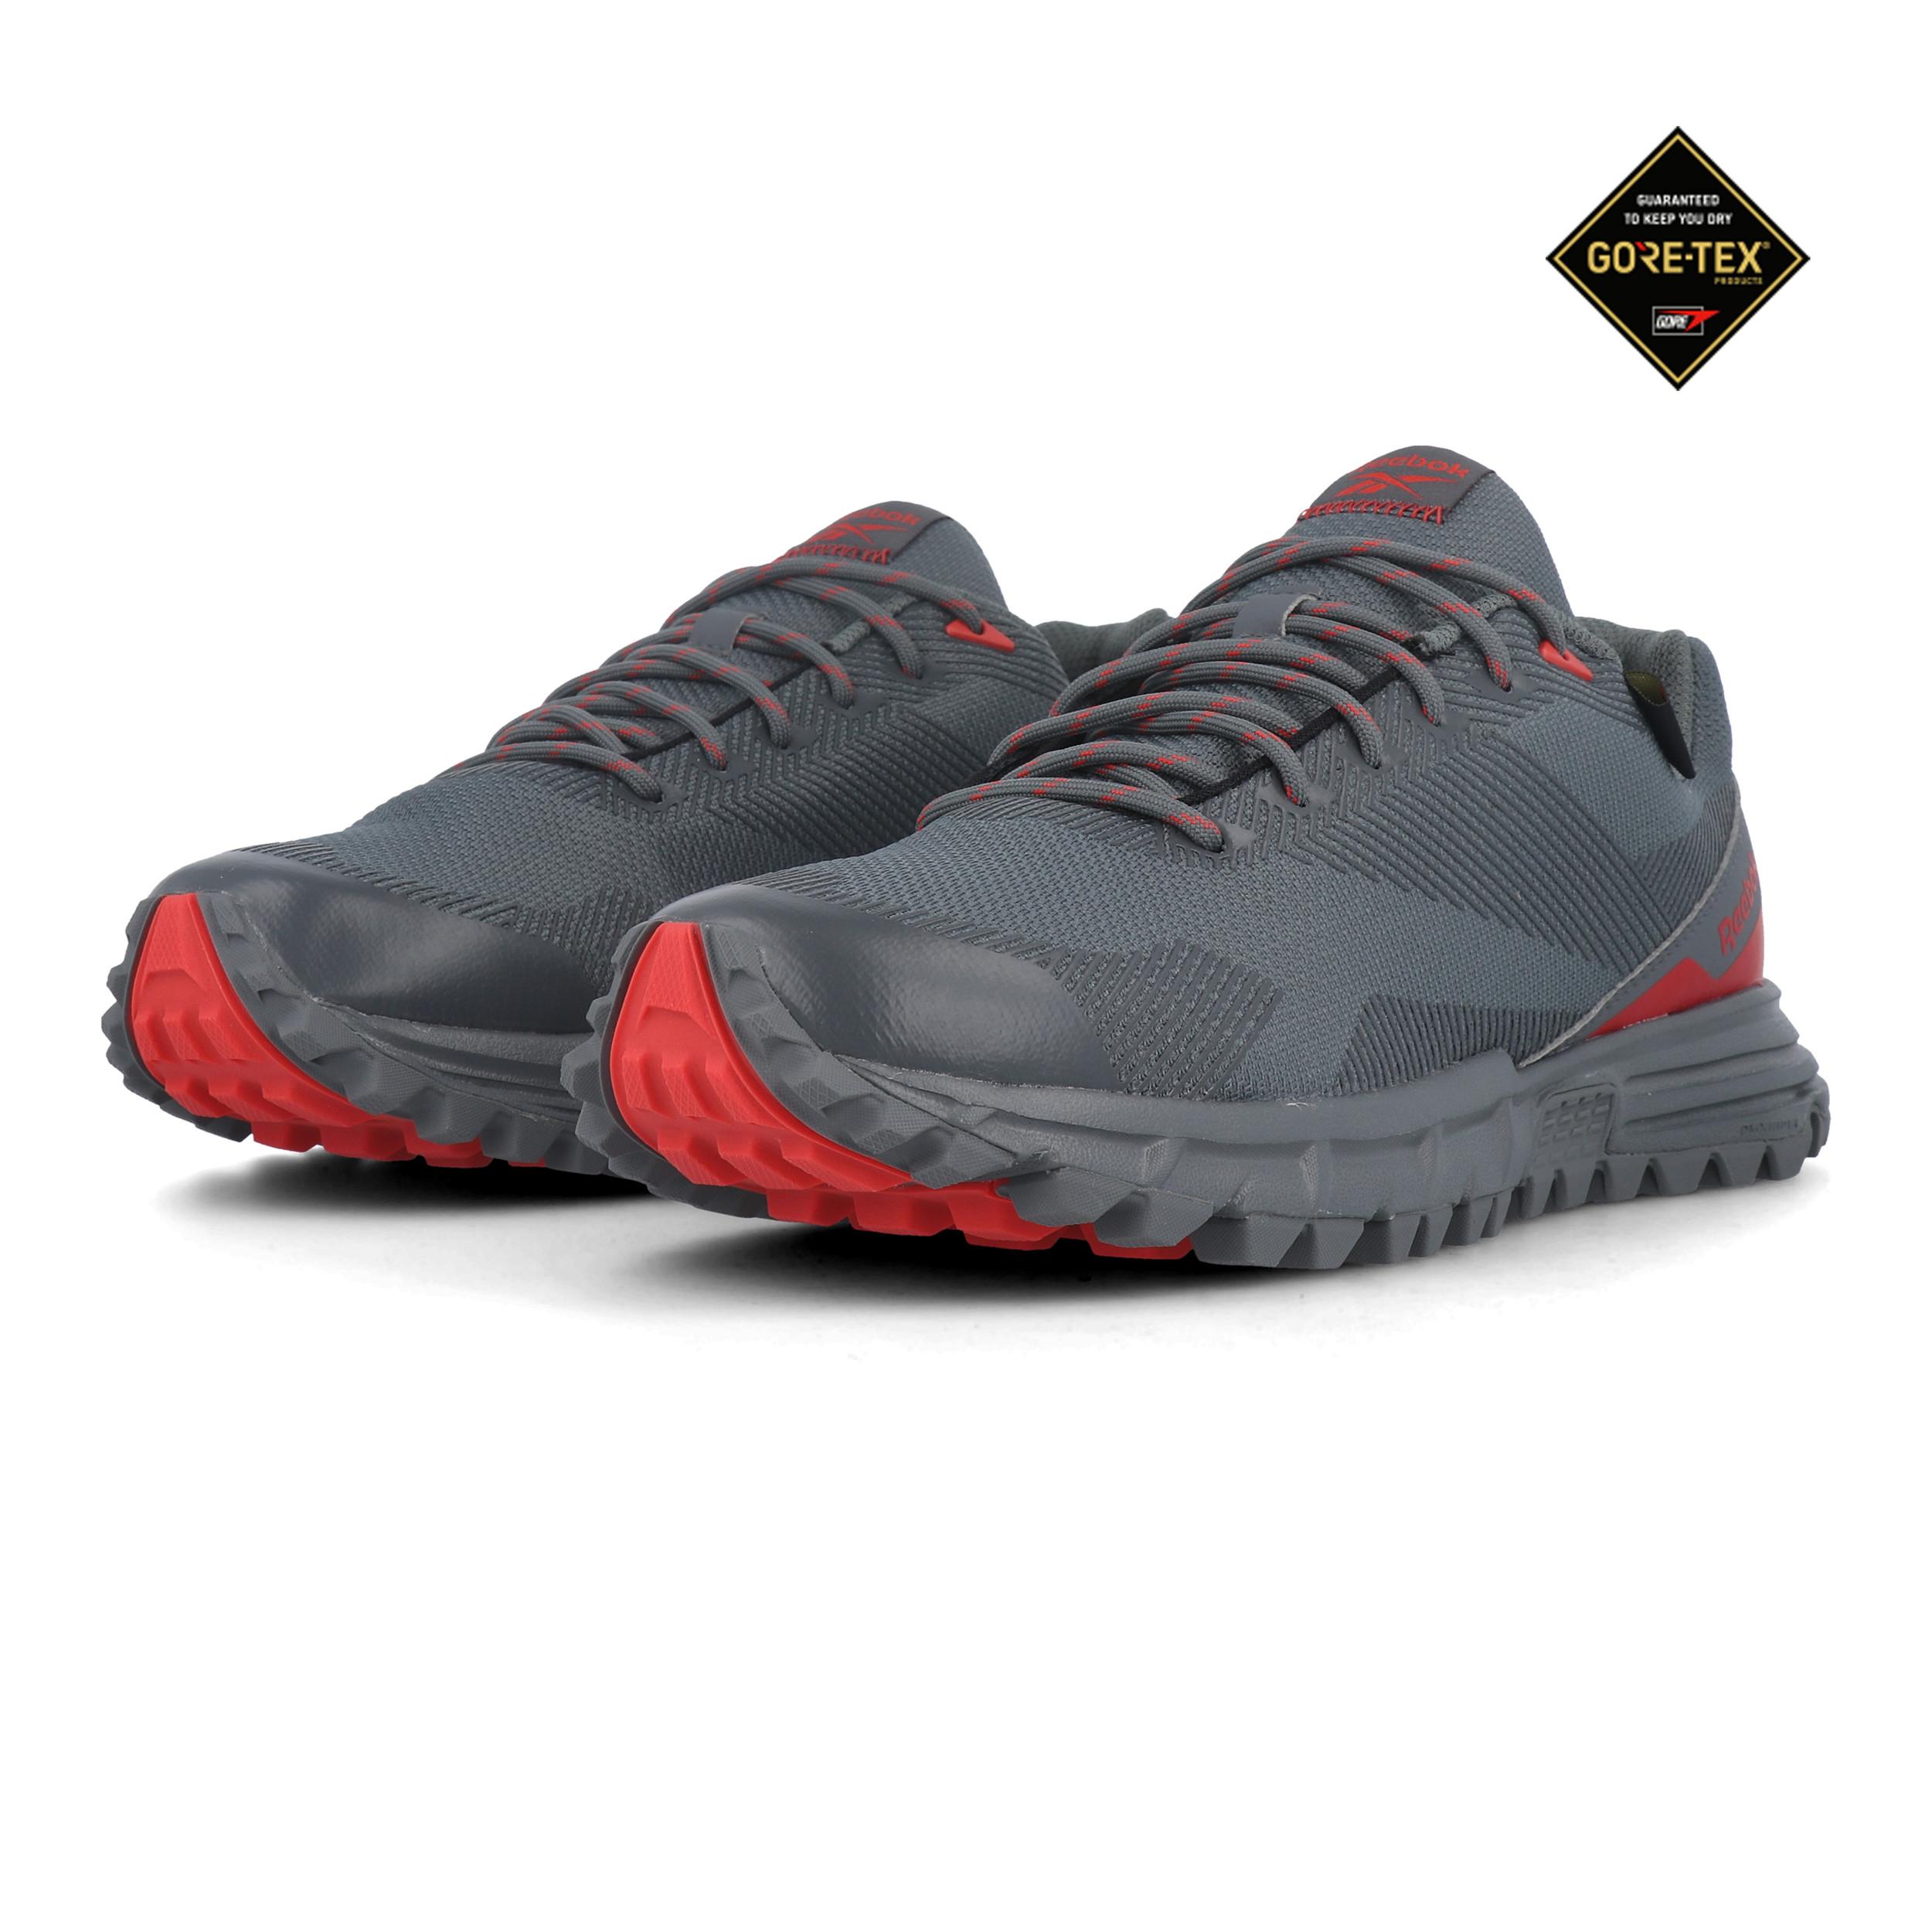 salomon men's xa thena gtx trail running shoes value